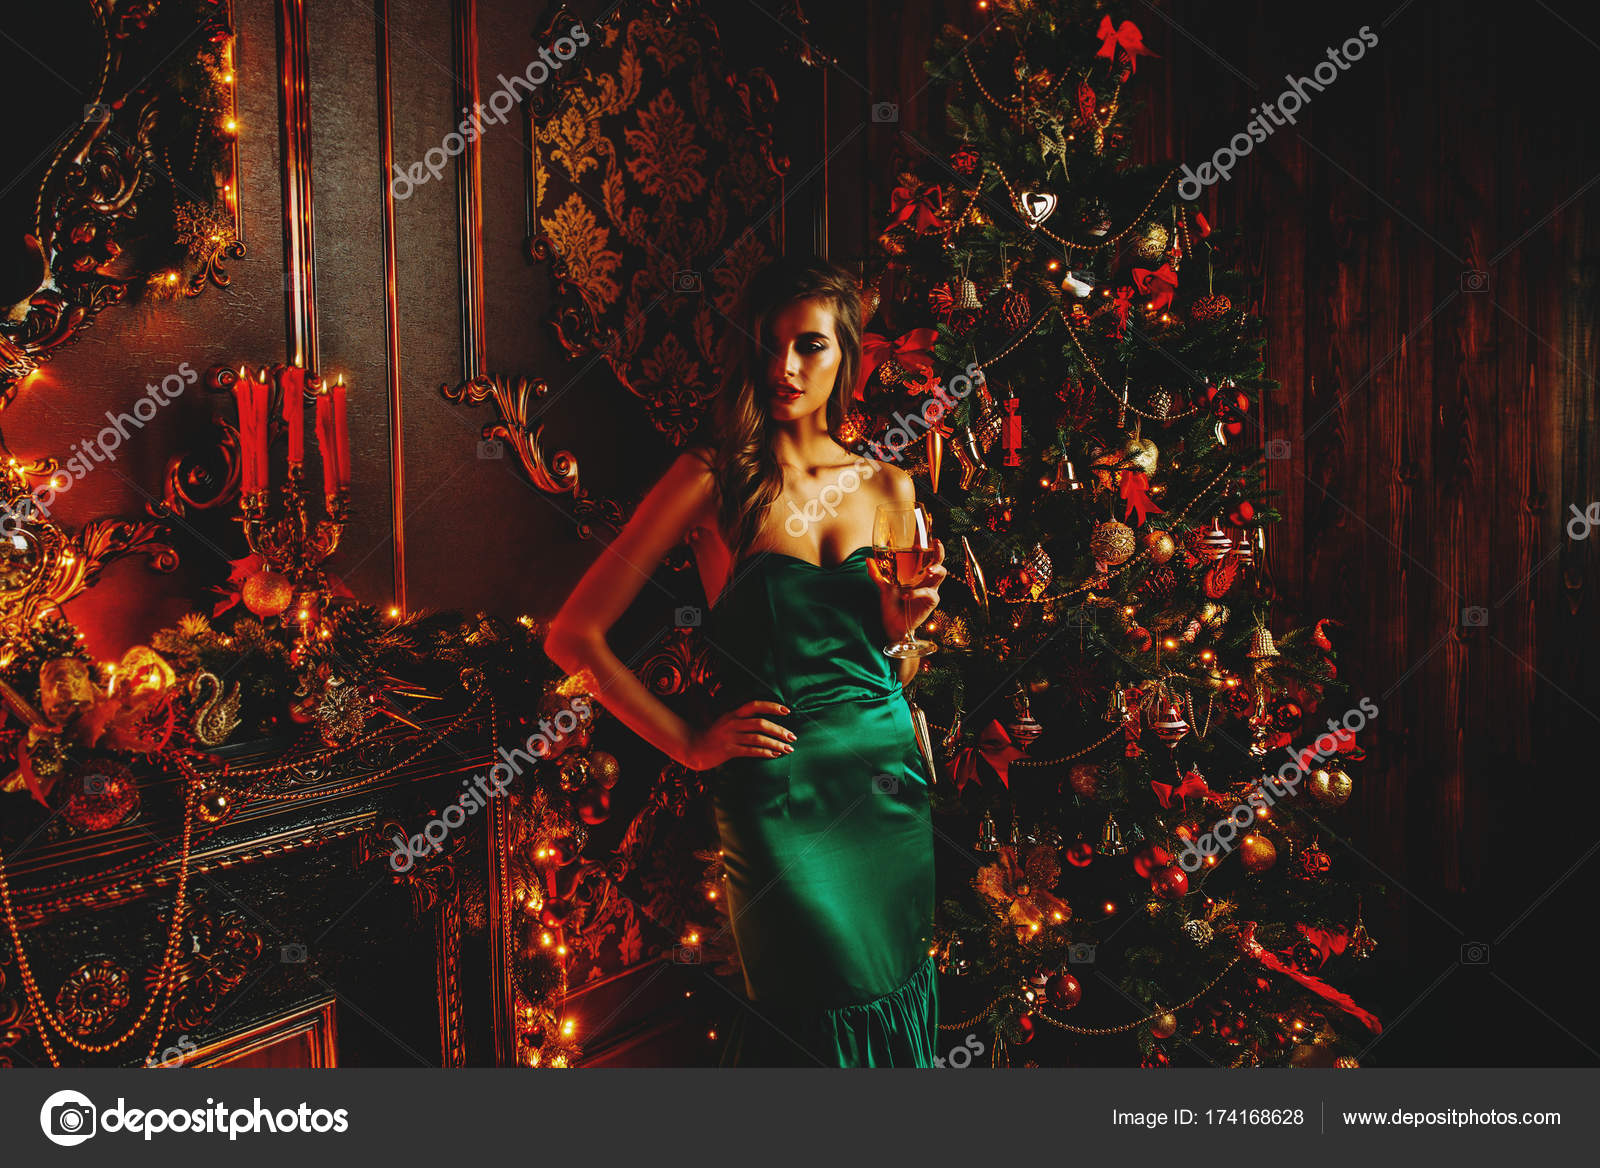 a133cdc47ca3 γυναίκα στο βραδινό ντύσιμο — Φωτογραφία Αρχείου © prometeus  174168628